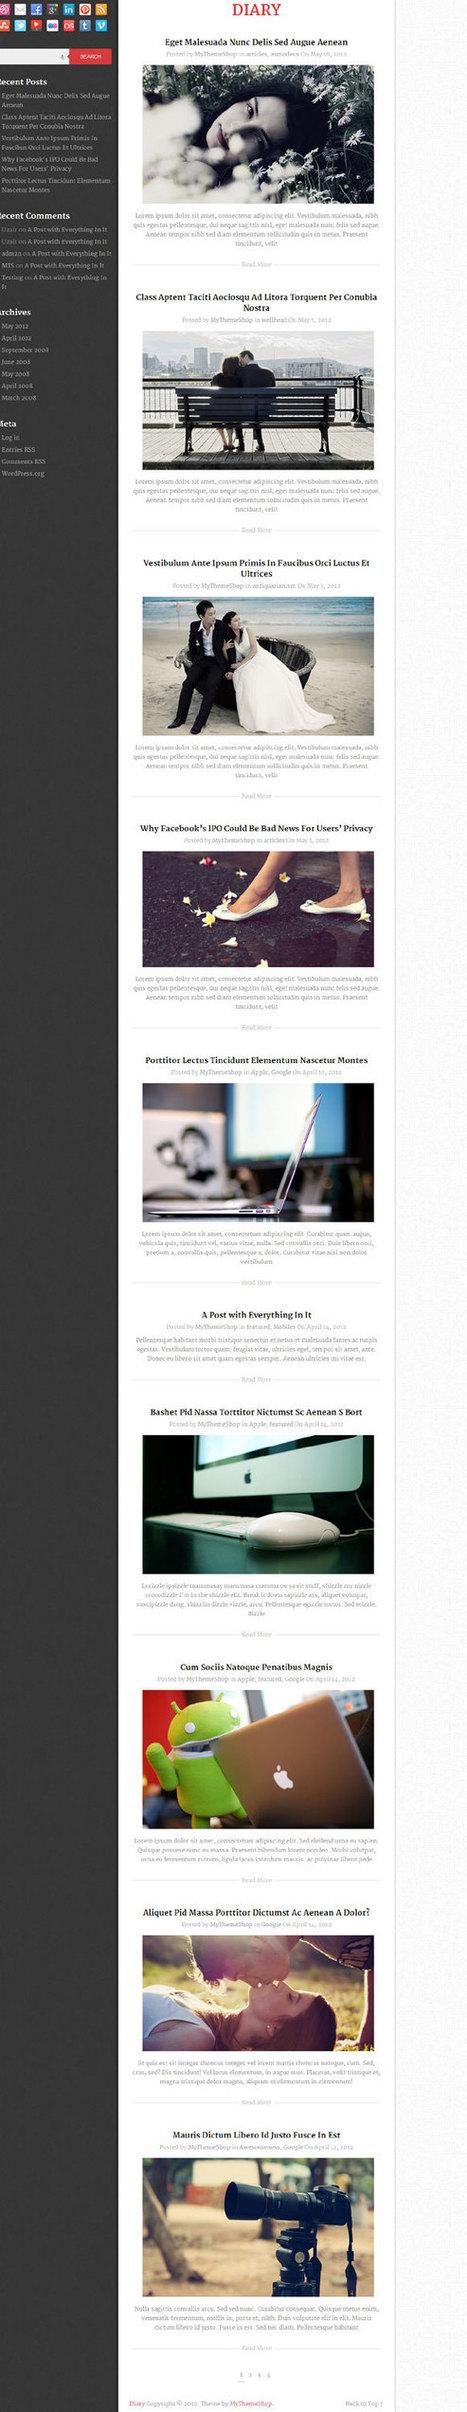 Diary, Free Responsive Blog-style WordPress Theme   Free WordPress Themes VR   Scoop.it